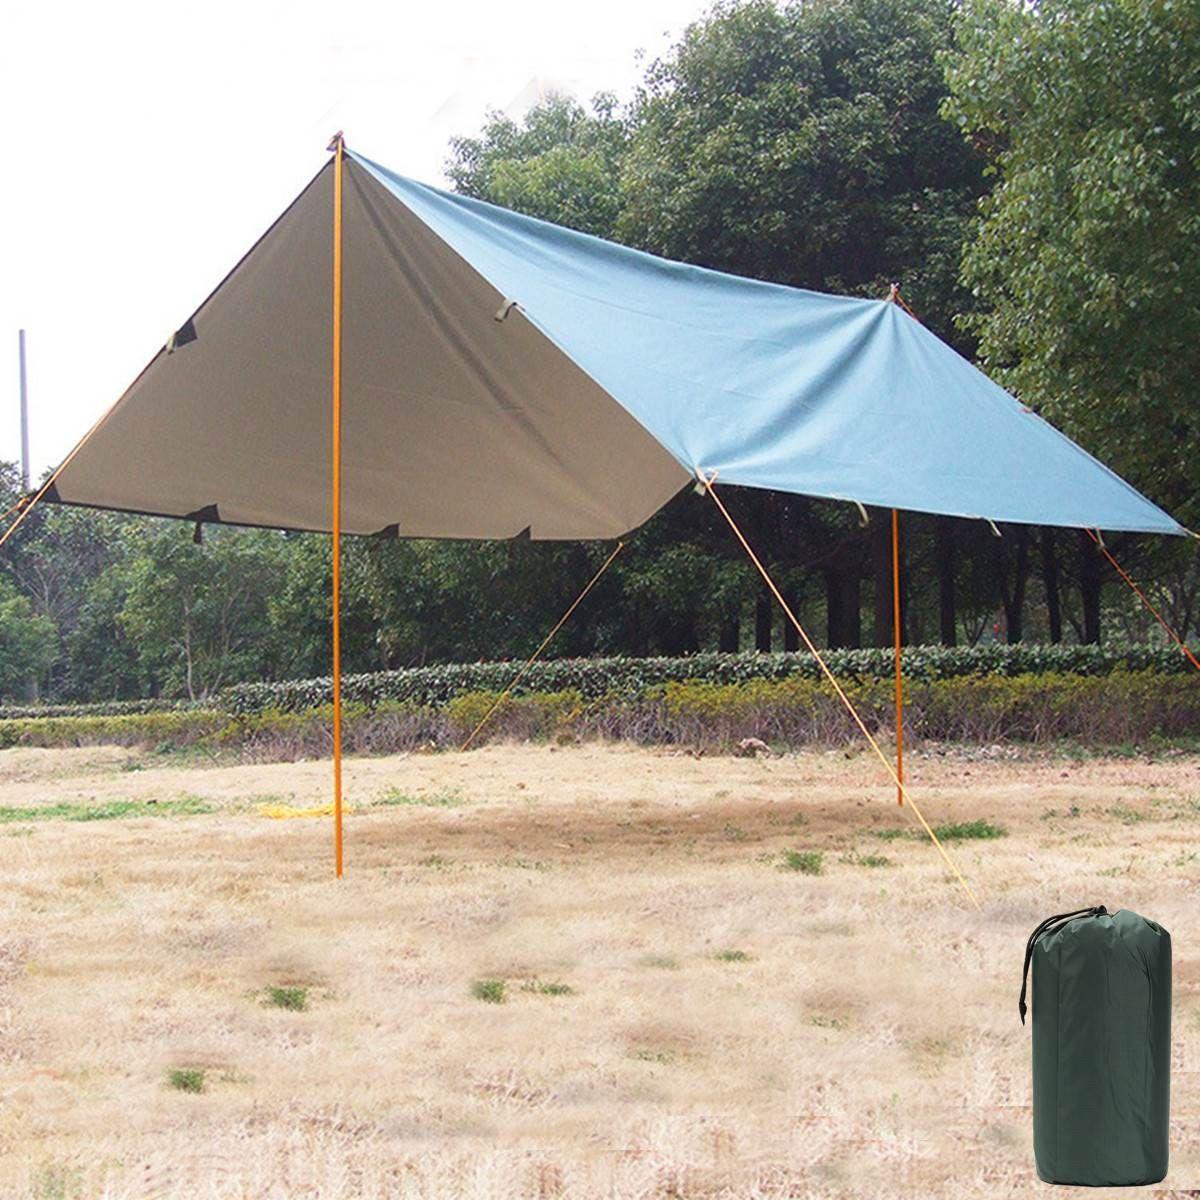 3mx3.2m Ultralight Outdoor C&ing Tent Coating Canopy Lightweight Oxford Gazebo Beach Sun Shelter Outdoor Beach Travel Kits Shelter Cymru Pet Shelters Near ... & 3mx3.2m Ultralight Outdoor Camping Tent Coating Canopy Lightweight ...